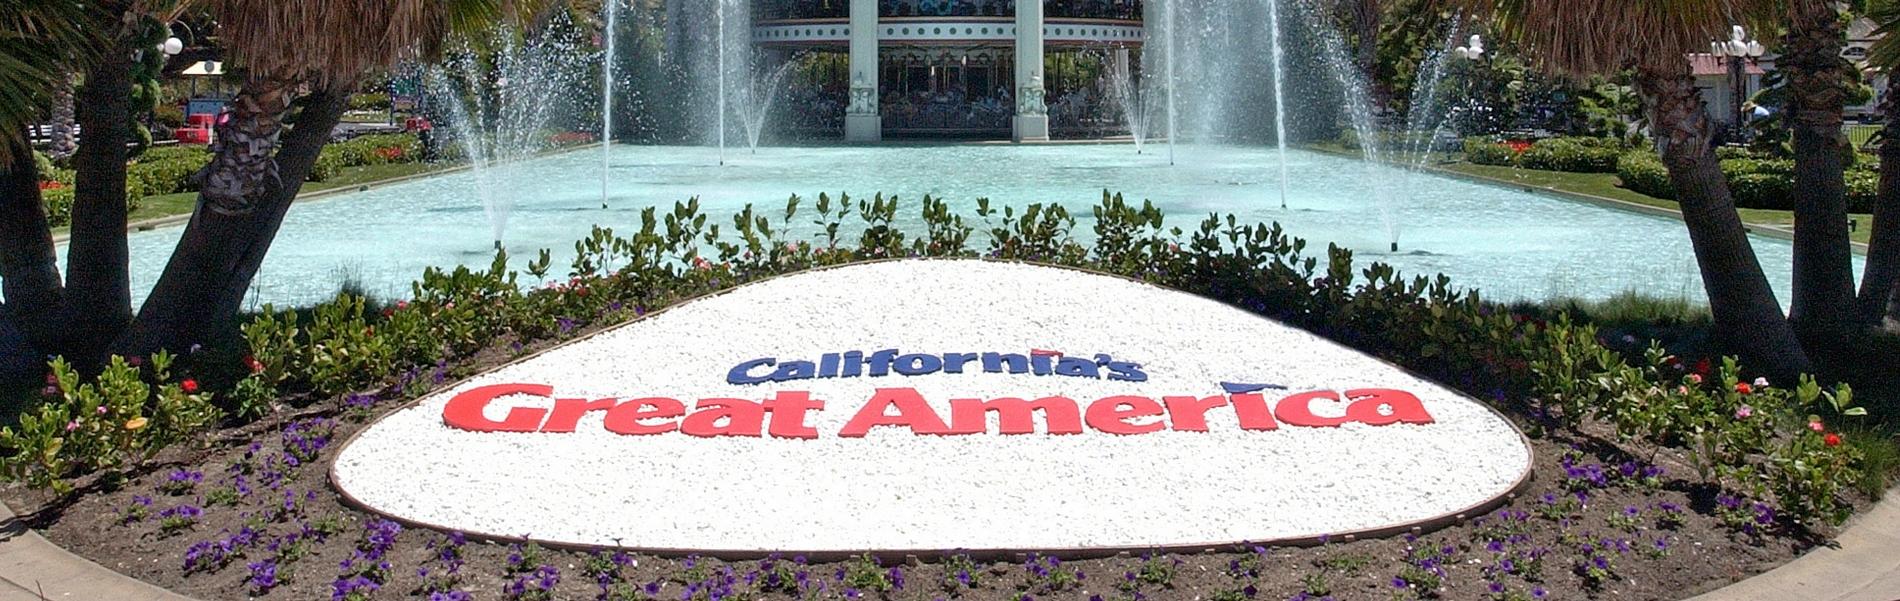 California's Great America sign in Santa Clara